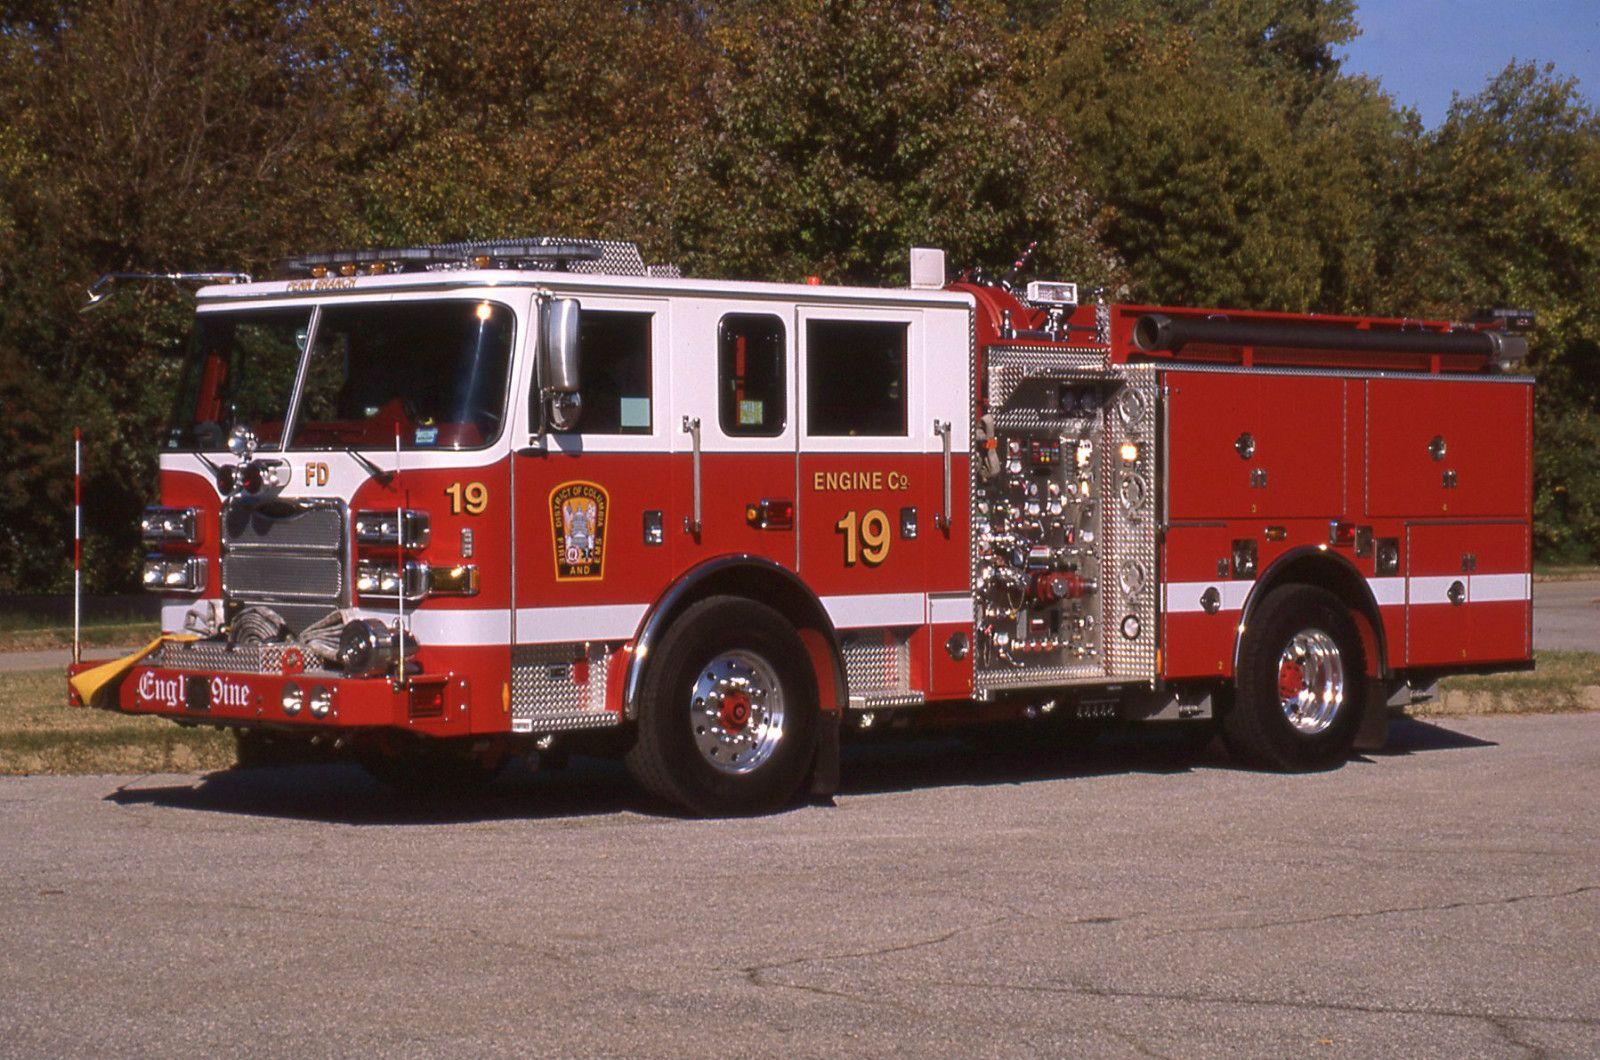 DCFD Engine 19 Fire trucks, New trucks, Rescue vehicles